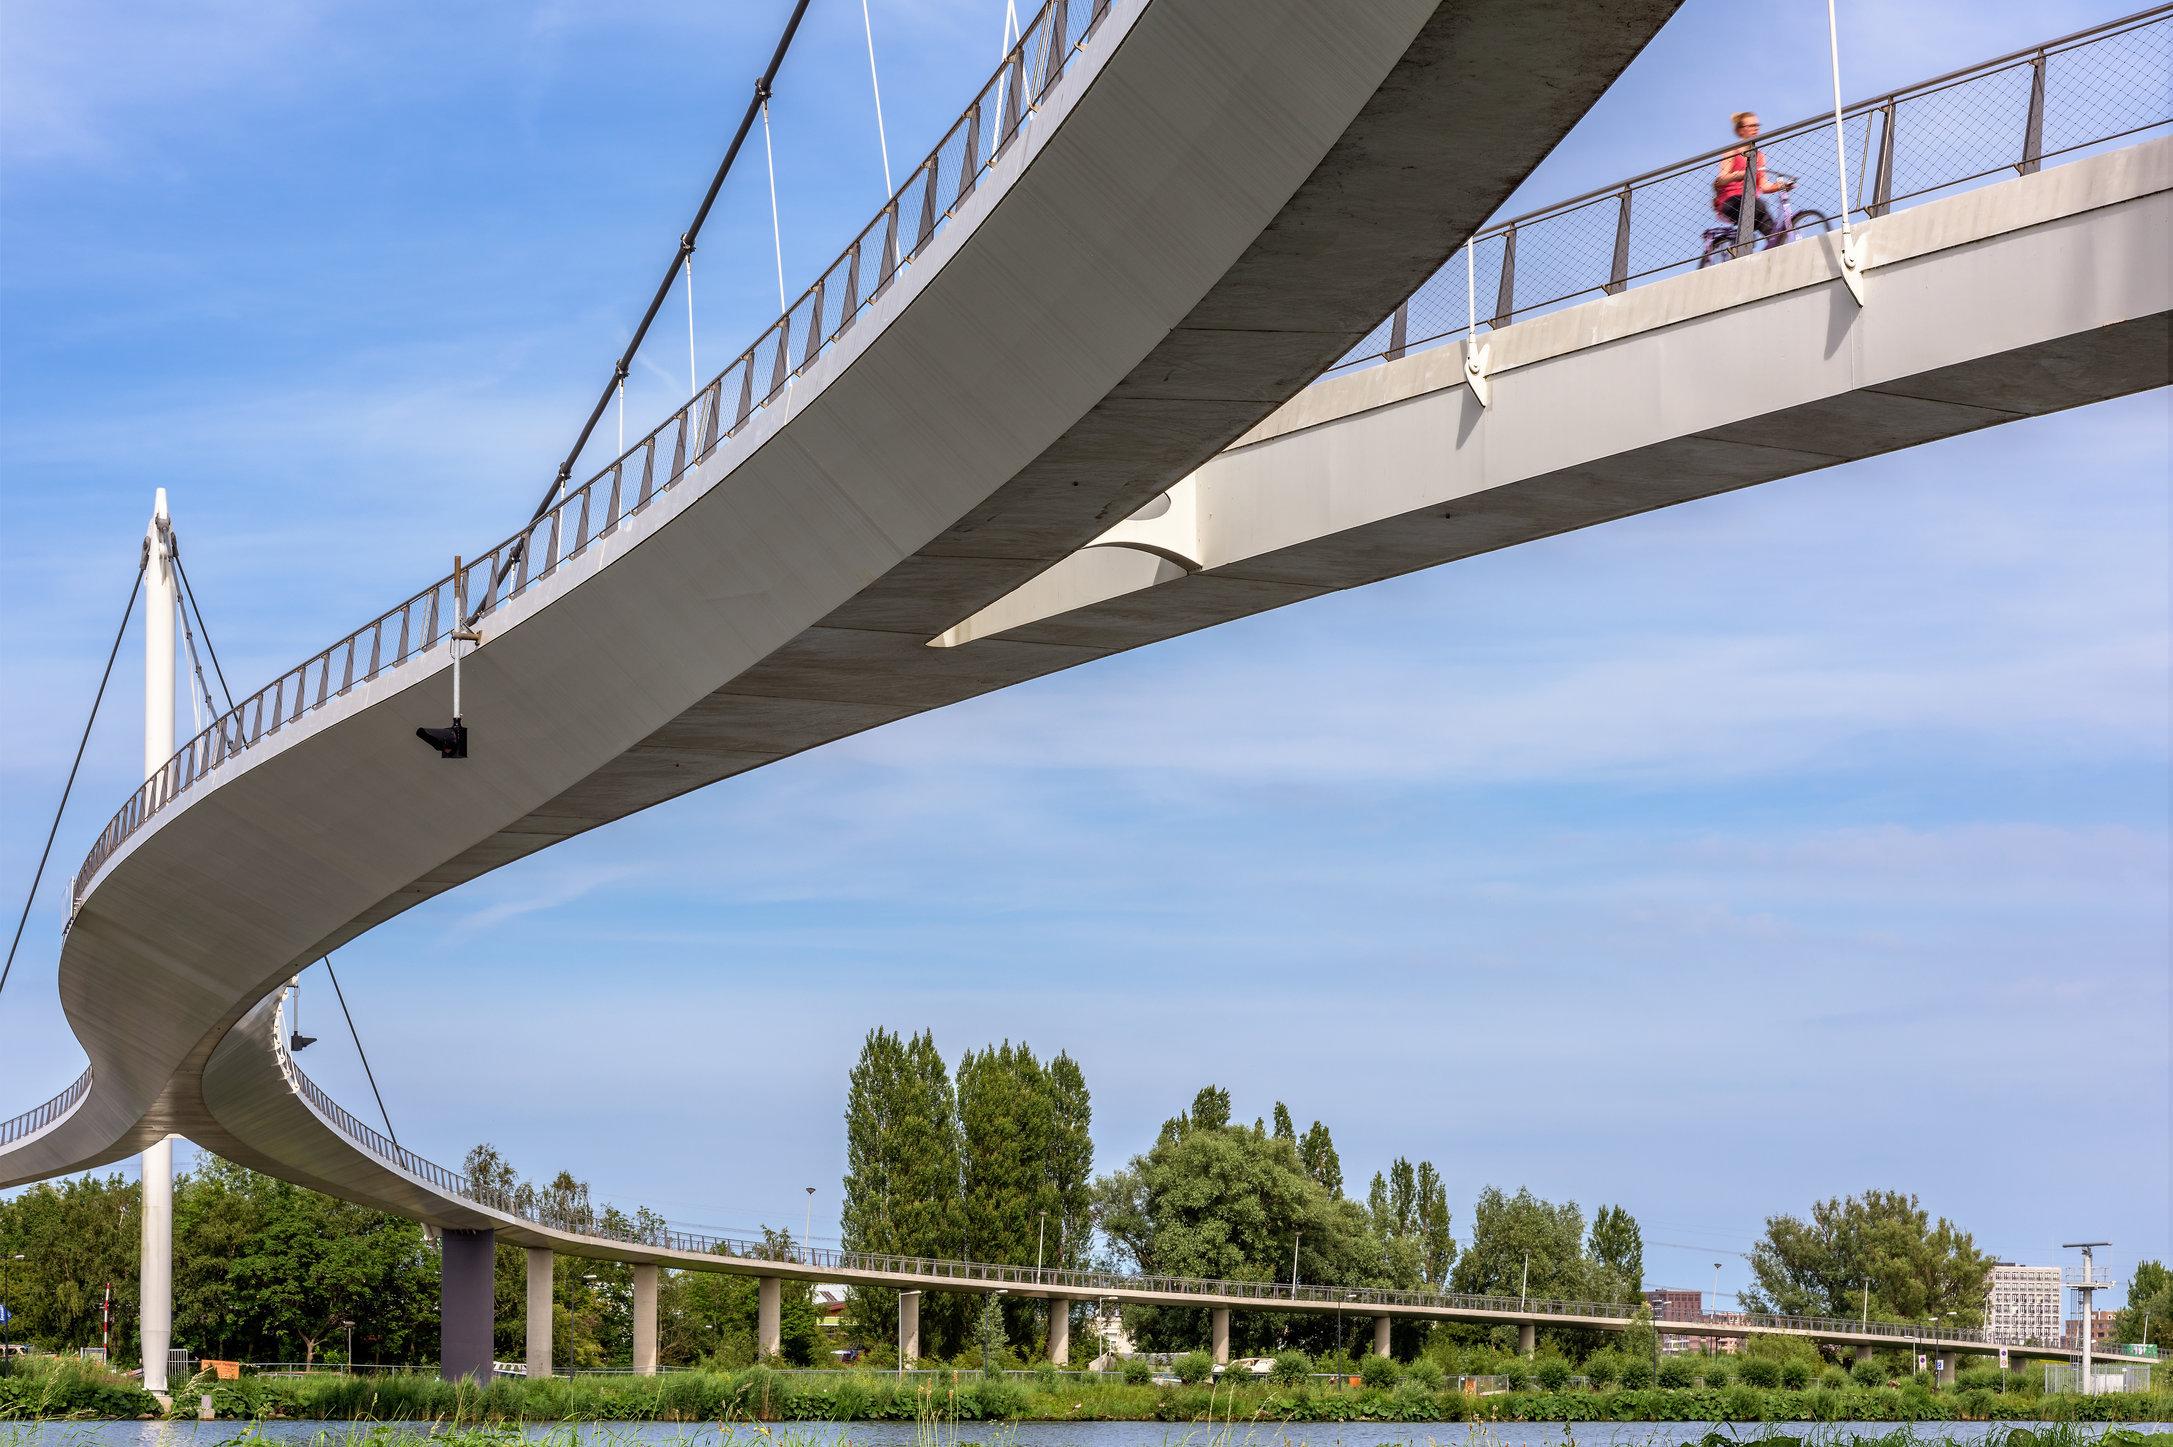 Nescio brug, Amsterdam